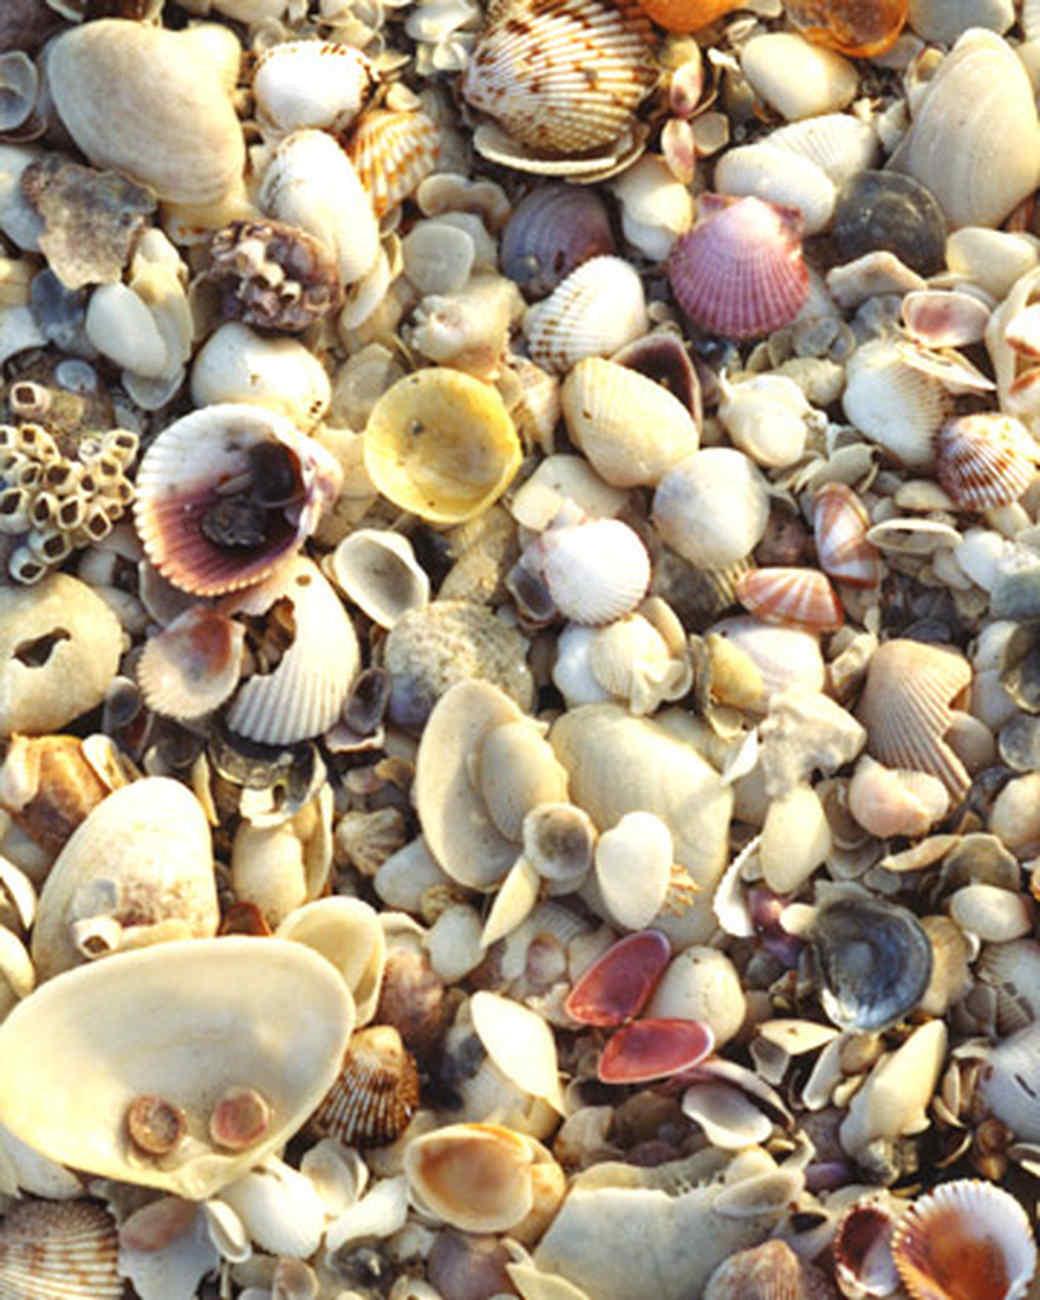 Shelling on sanibel island martha stewart shelling sweet spot nvjuhfo Gallery